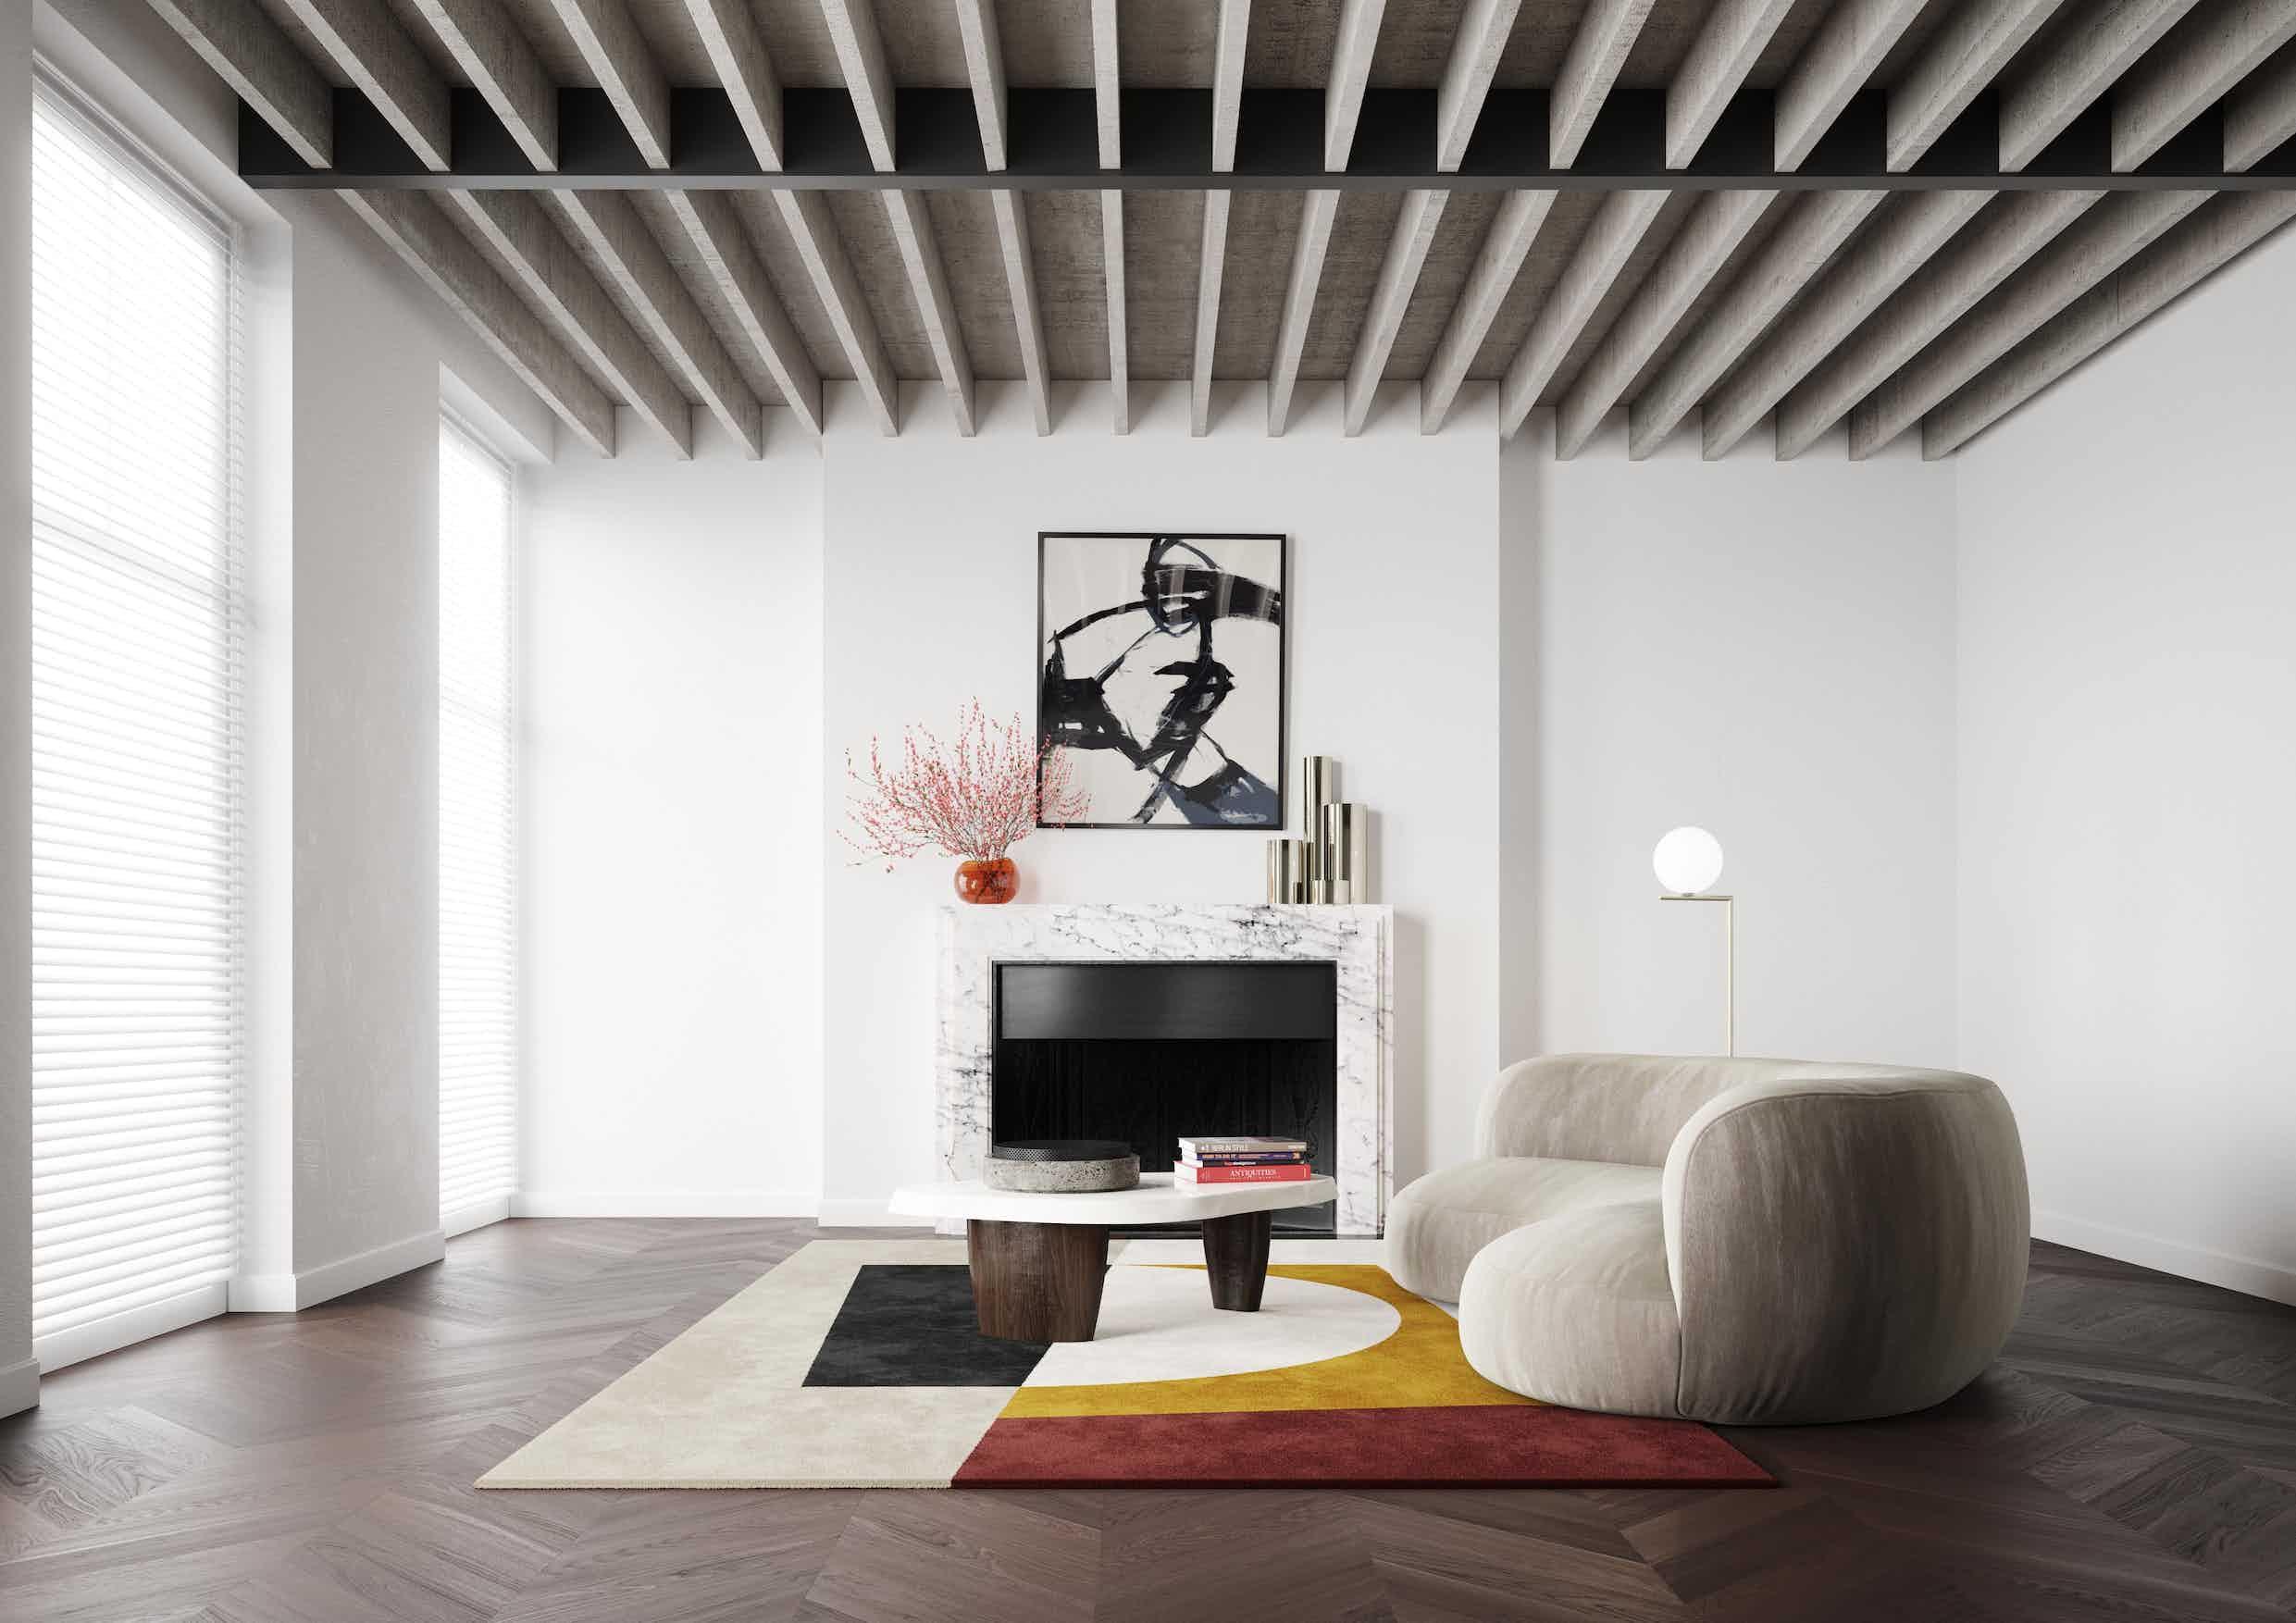 Bauhaus hero